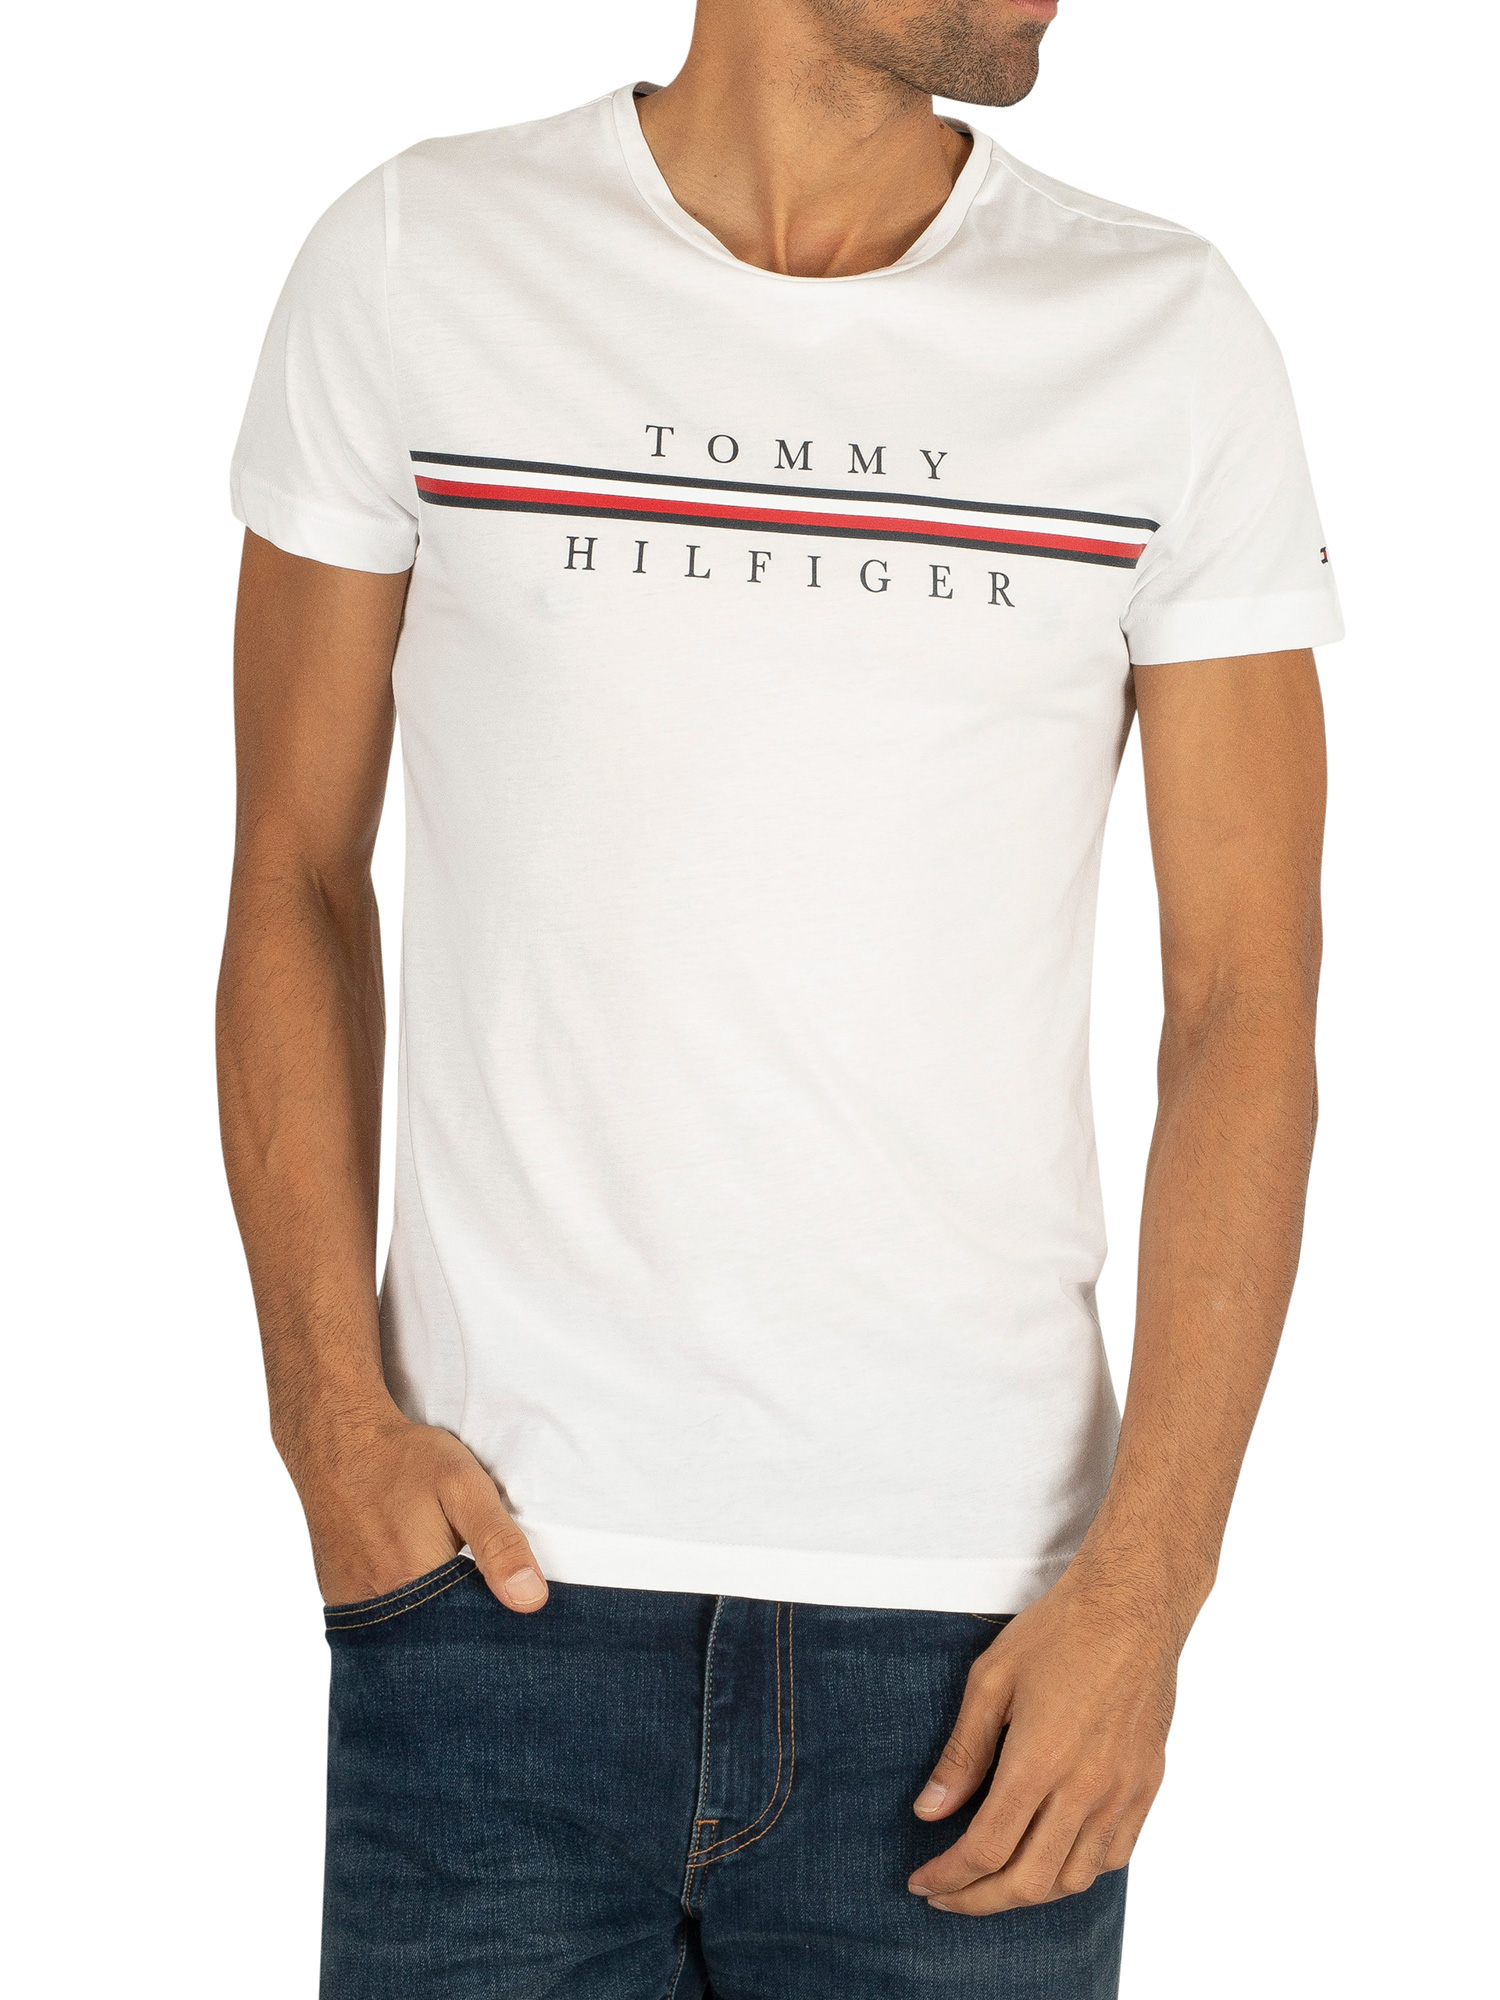 TOMMY HILFIGER sweat top uk size 2xl navy bnwt ref # box 43